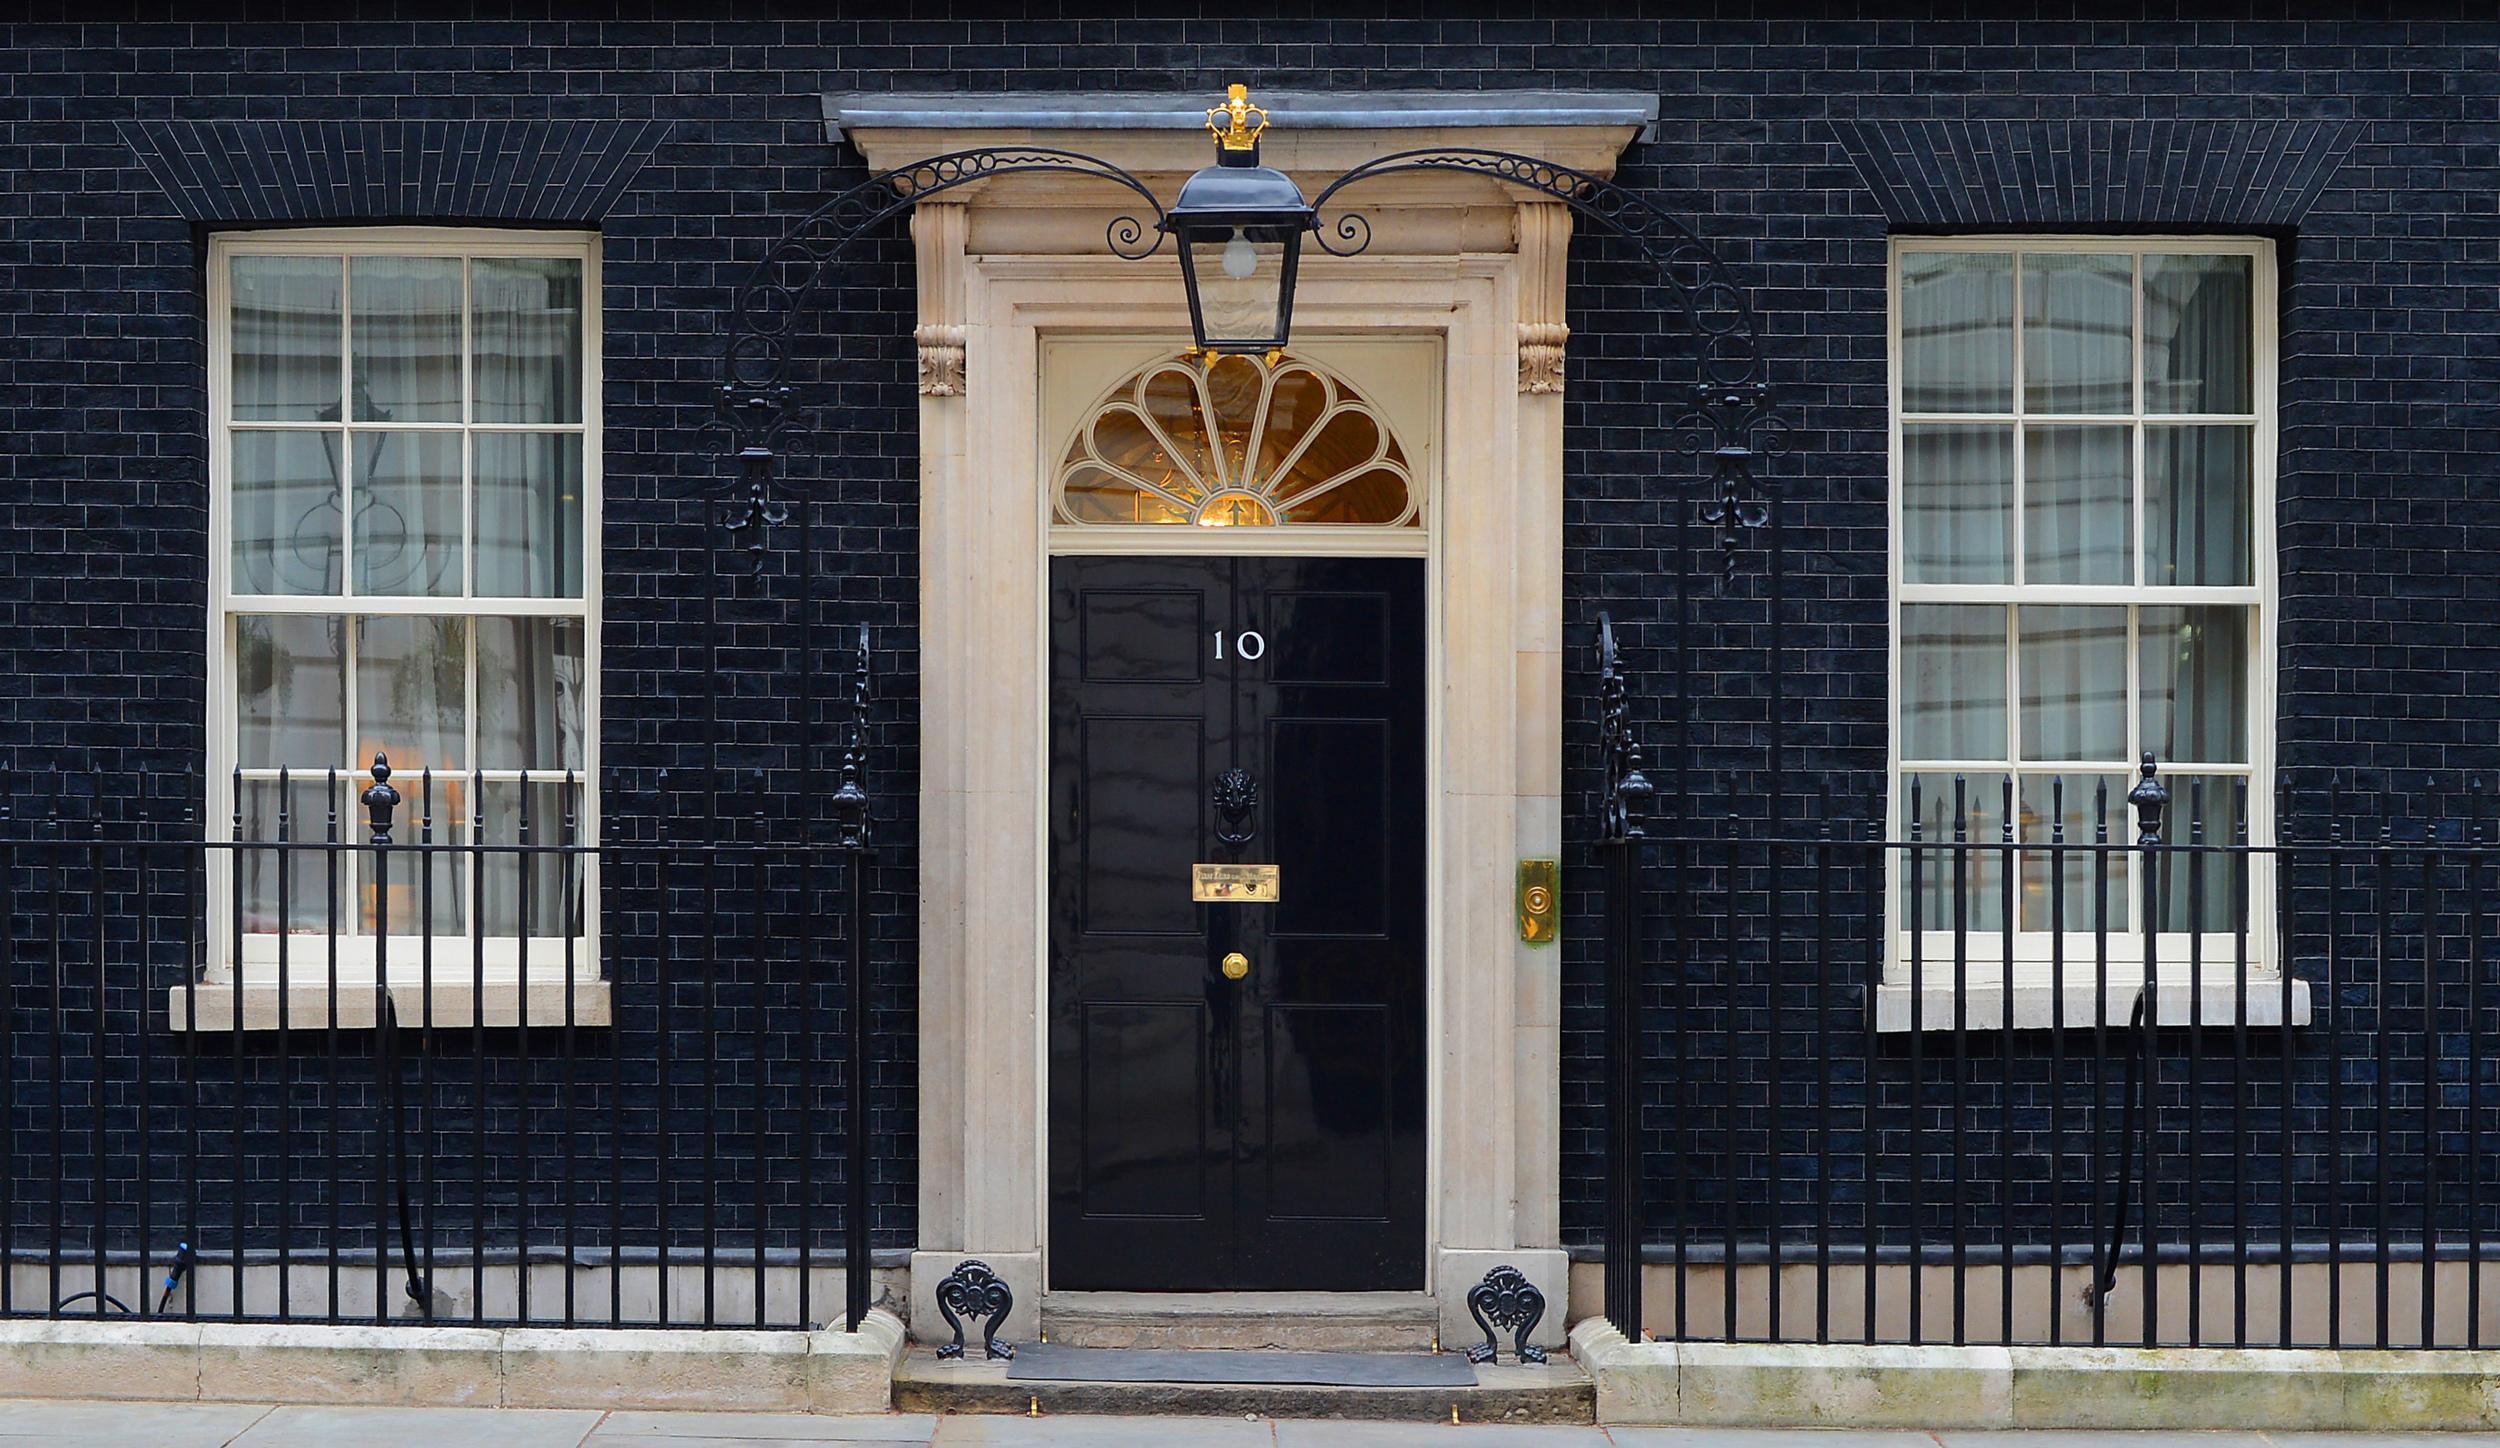 10 Downing Street | Source: Wikipedia